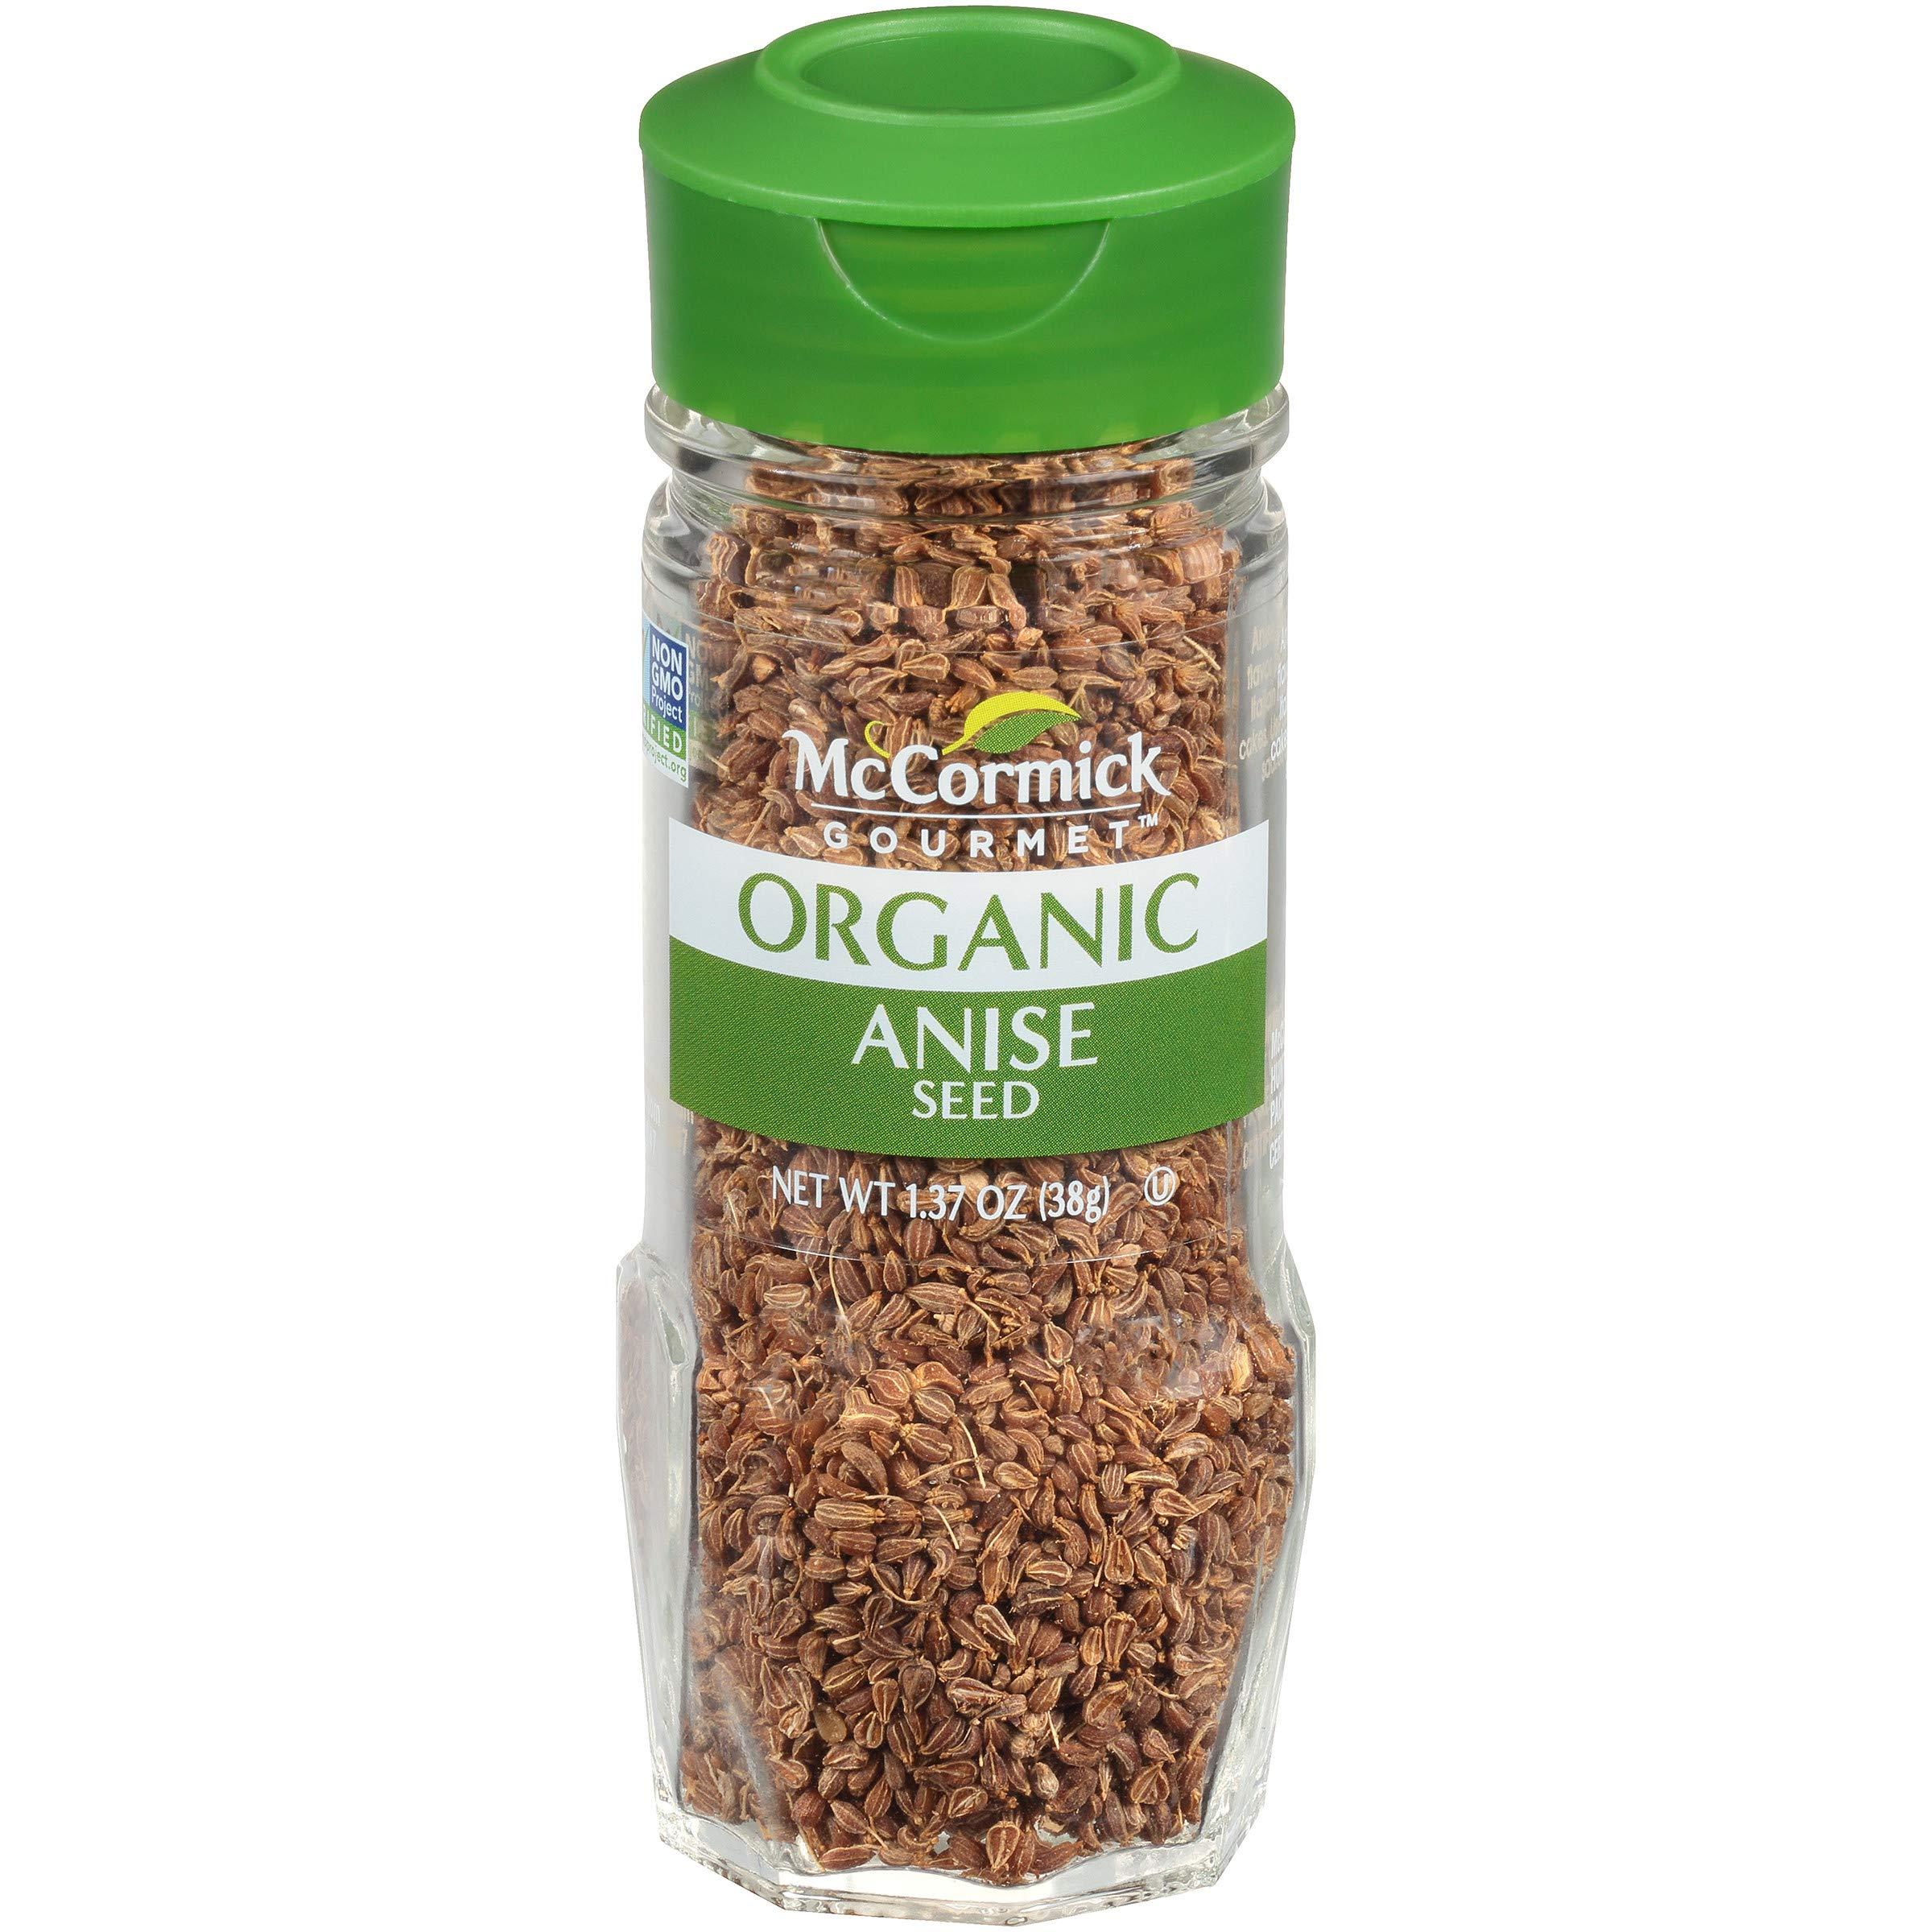 McCormick Gourmet Organic Anise Seed, 1.37 oz